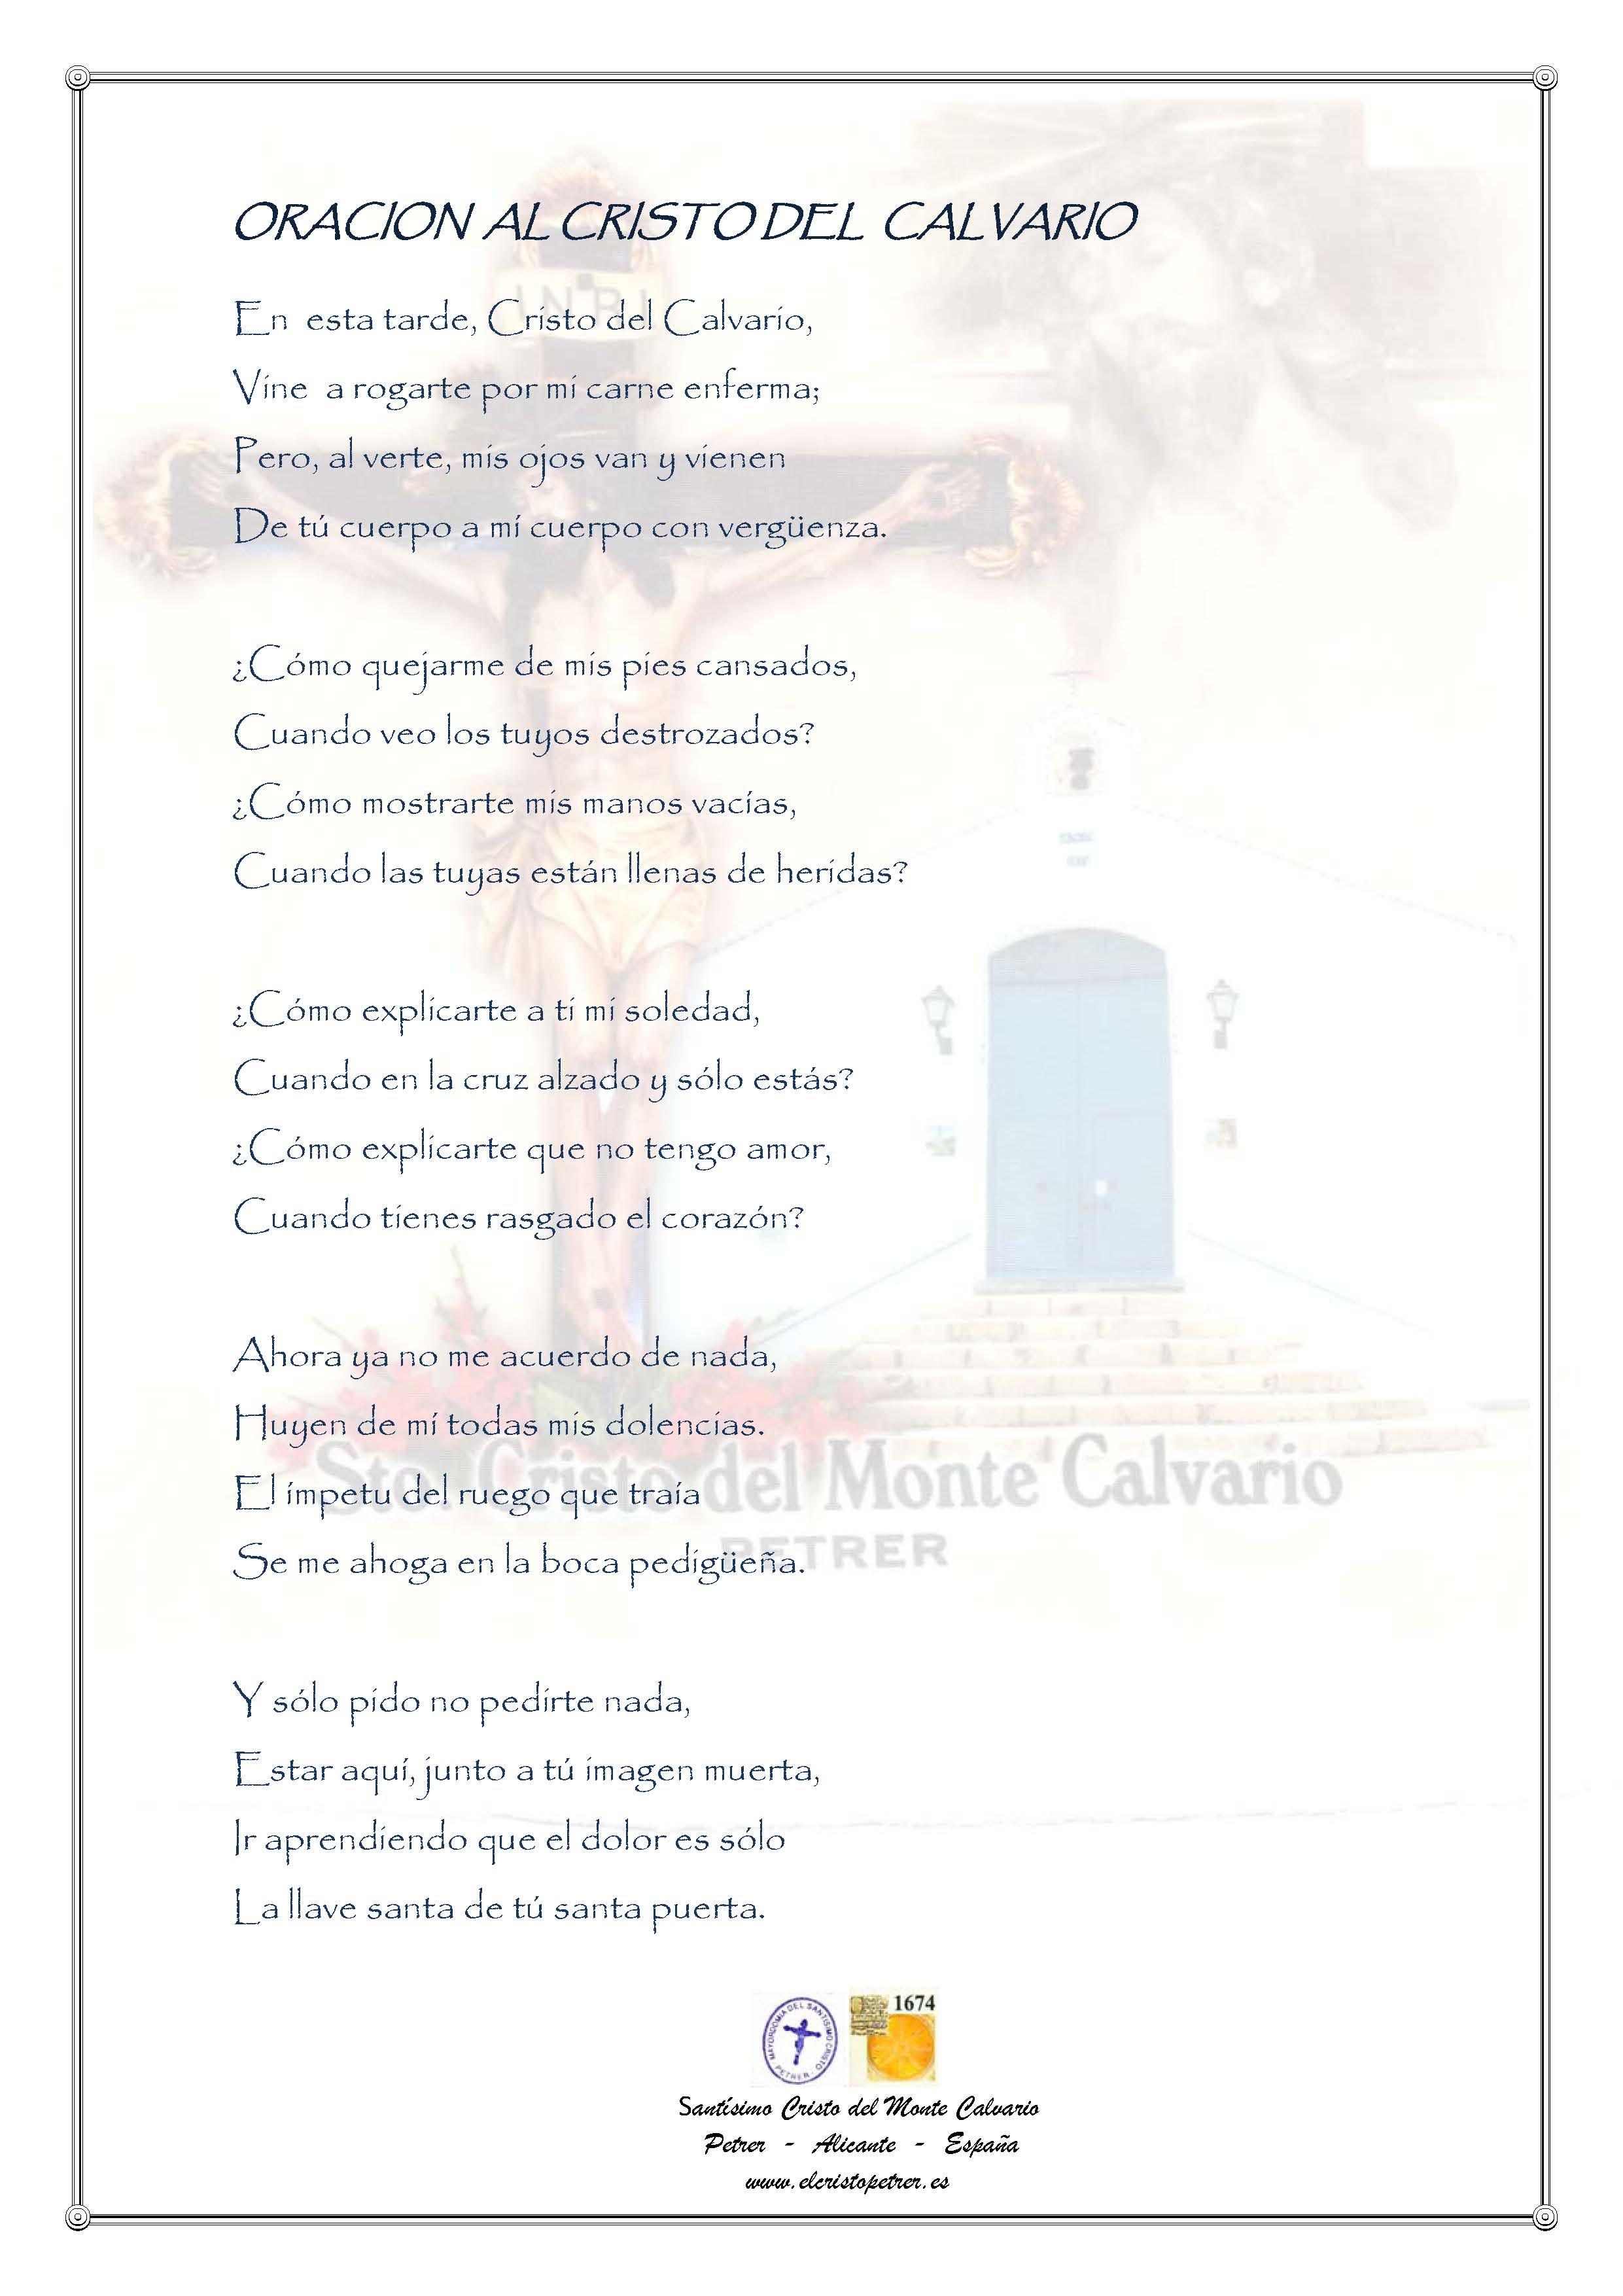 ElCristo - Oraciones - Anonimo - Revista xxxx - Al Cristo del Calvario